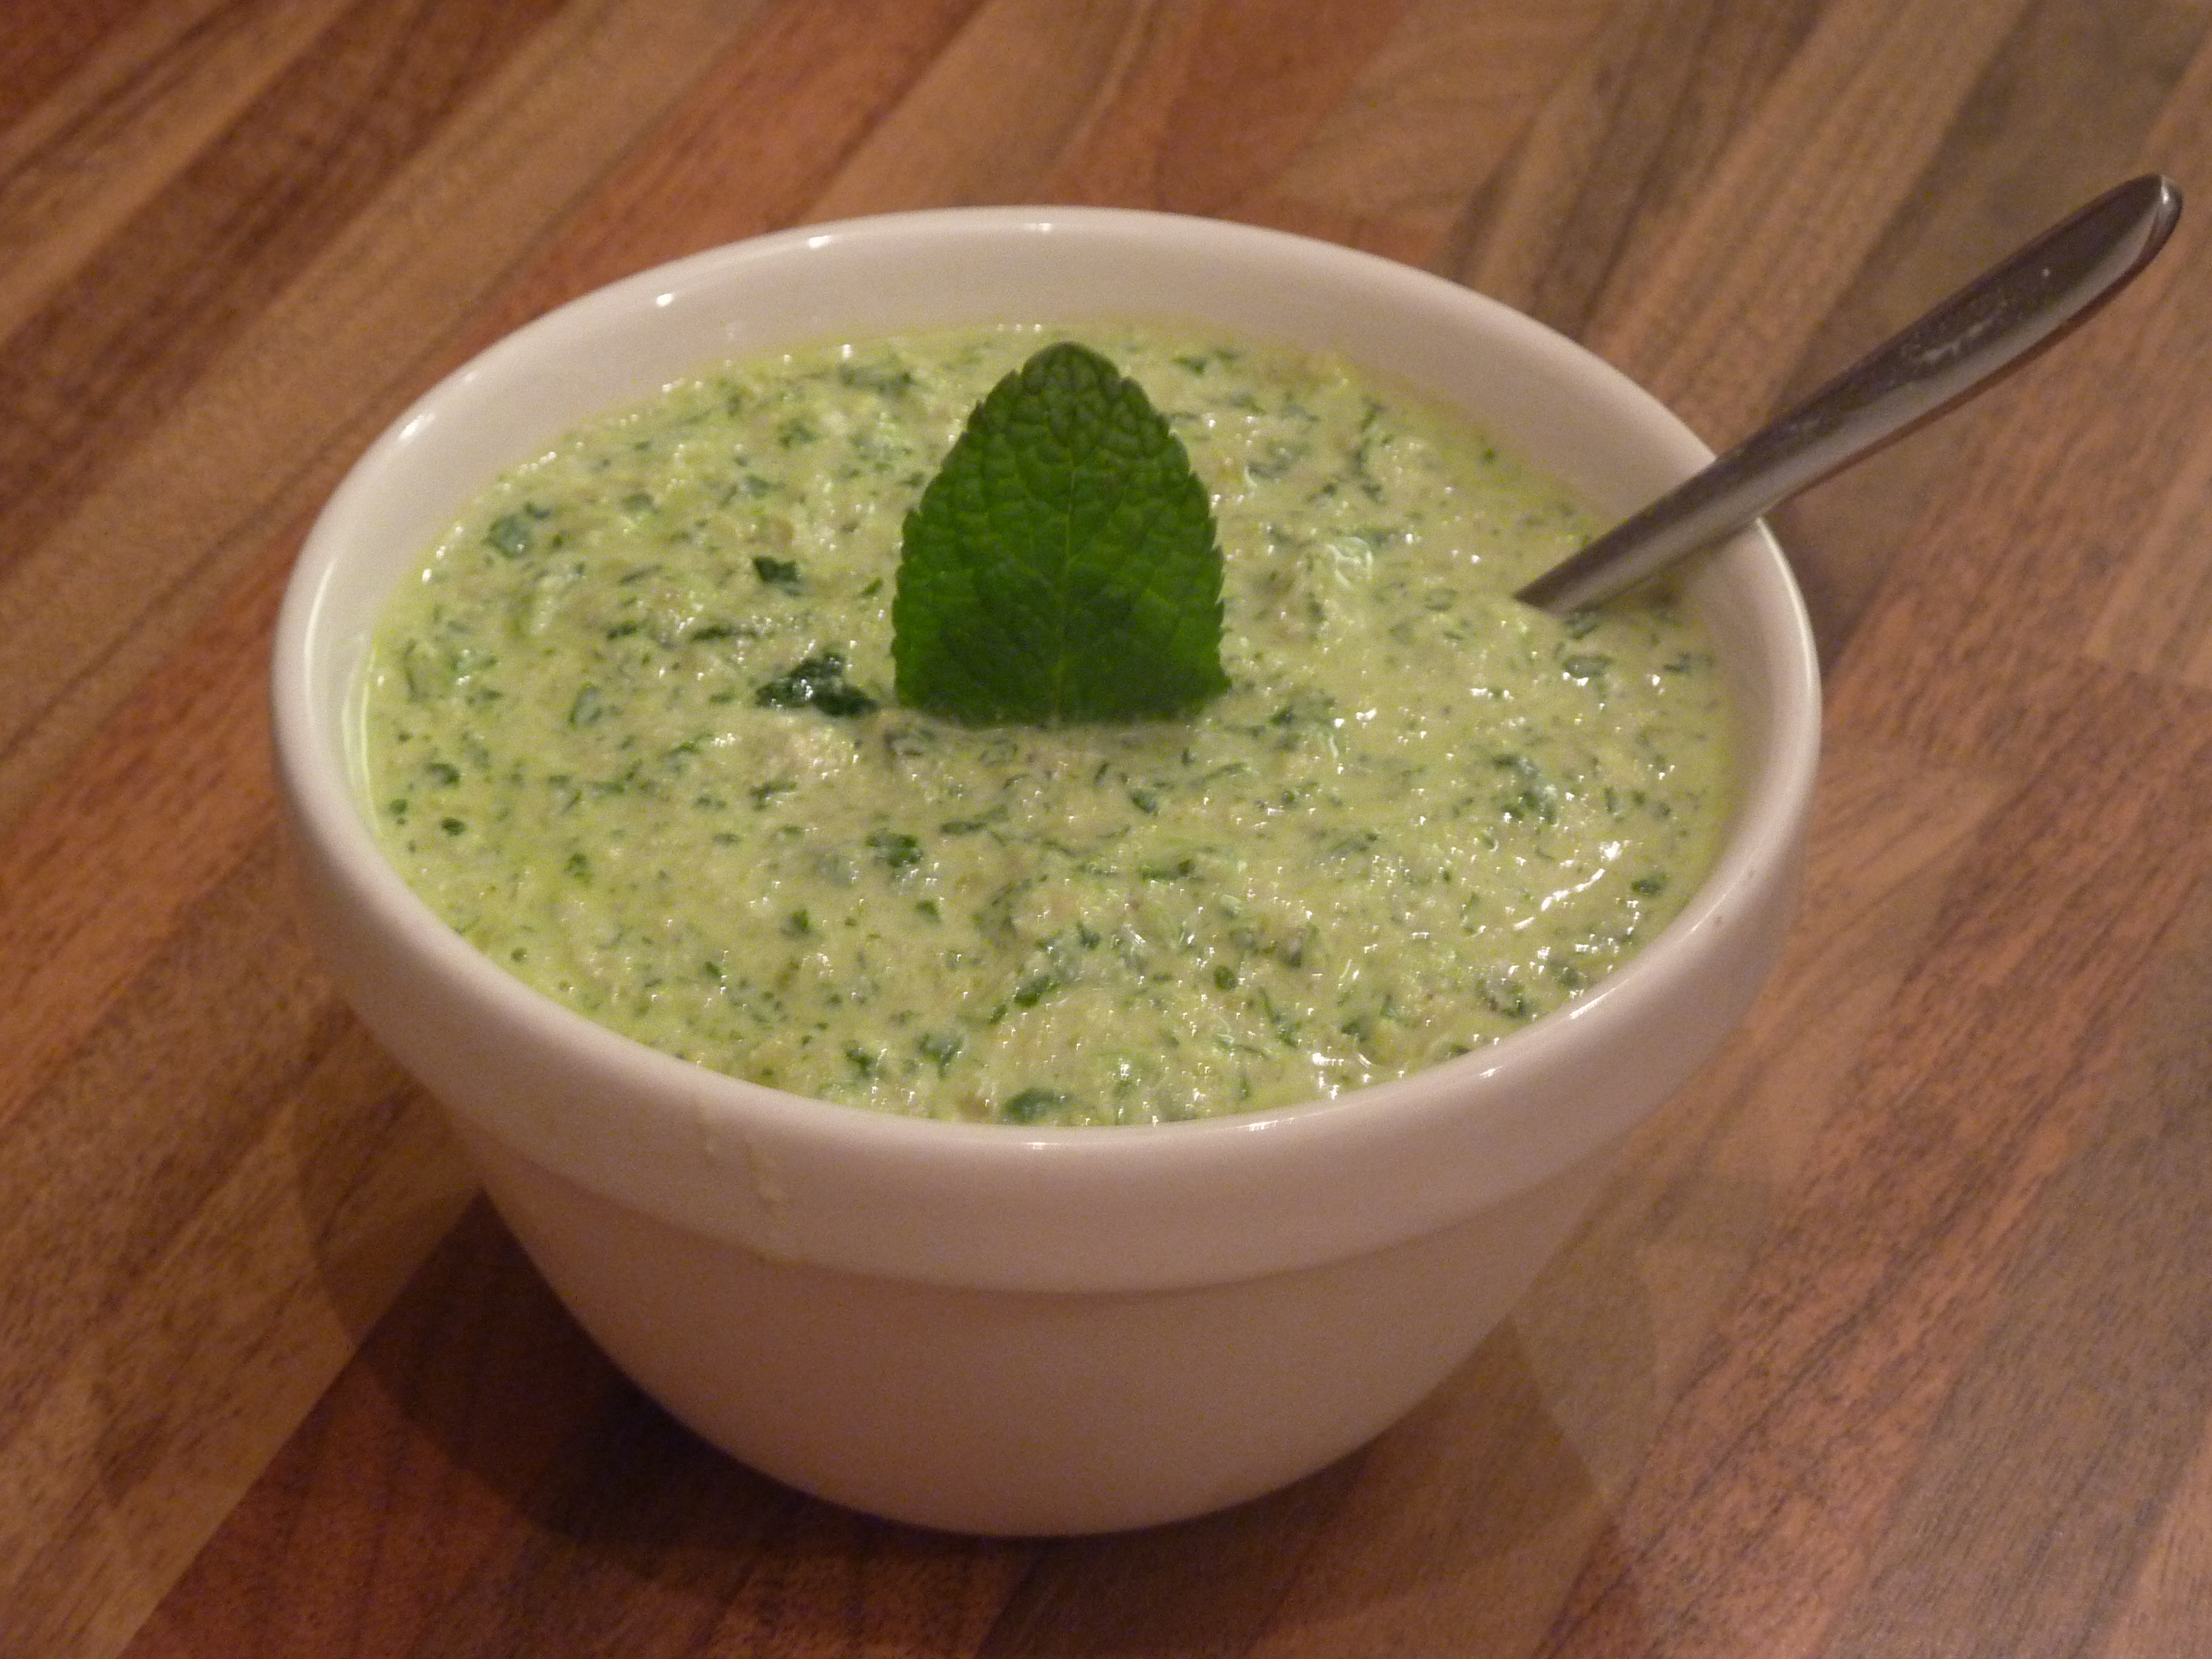 pea dip tofu ricotta creamy green peas masala creamy vegan tofu ...